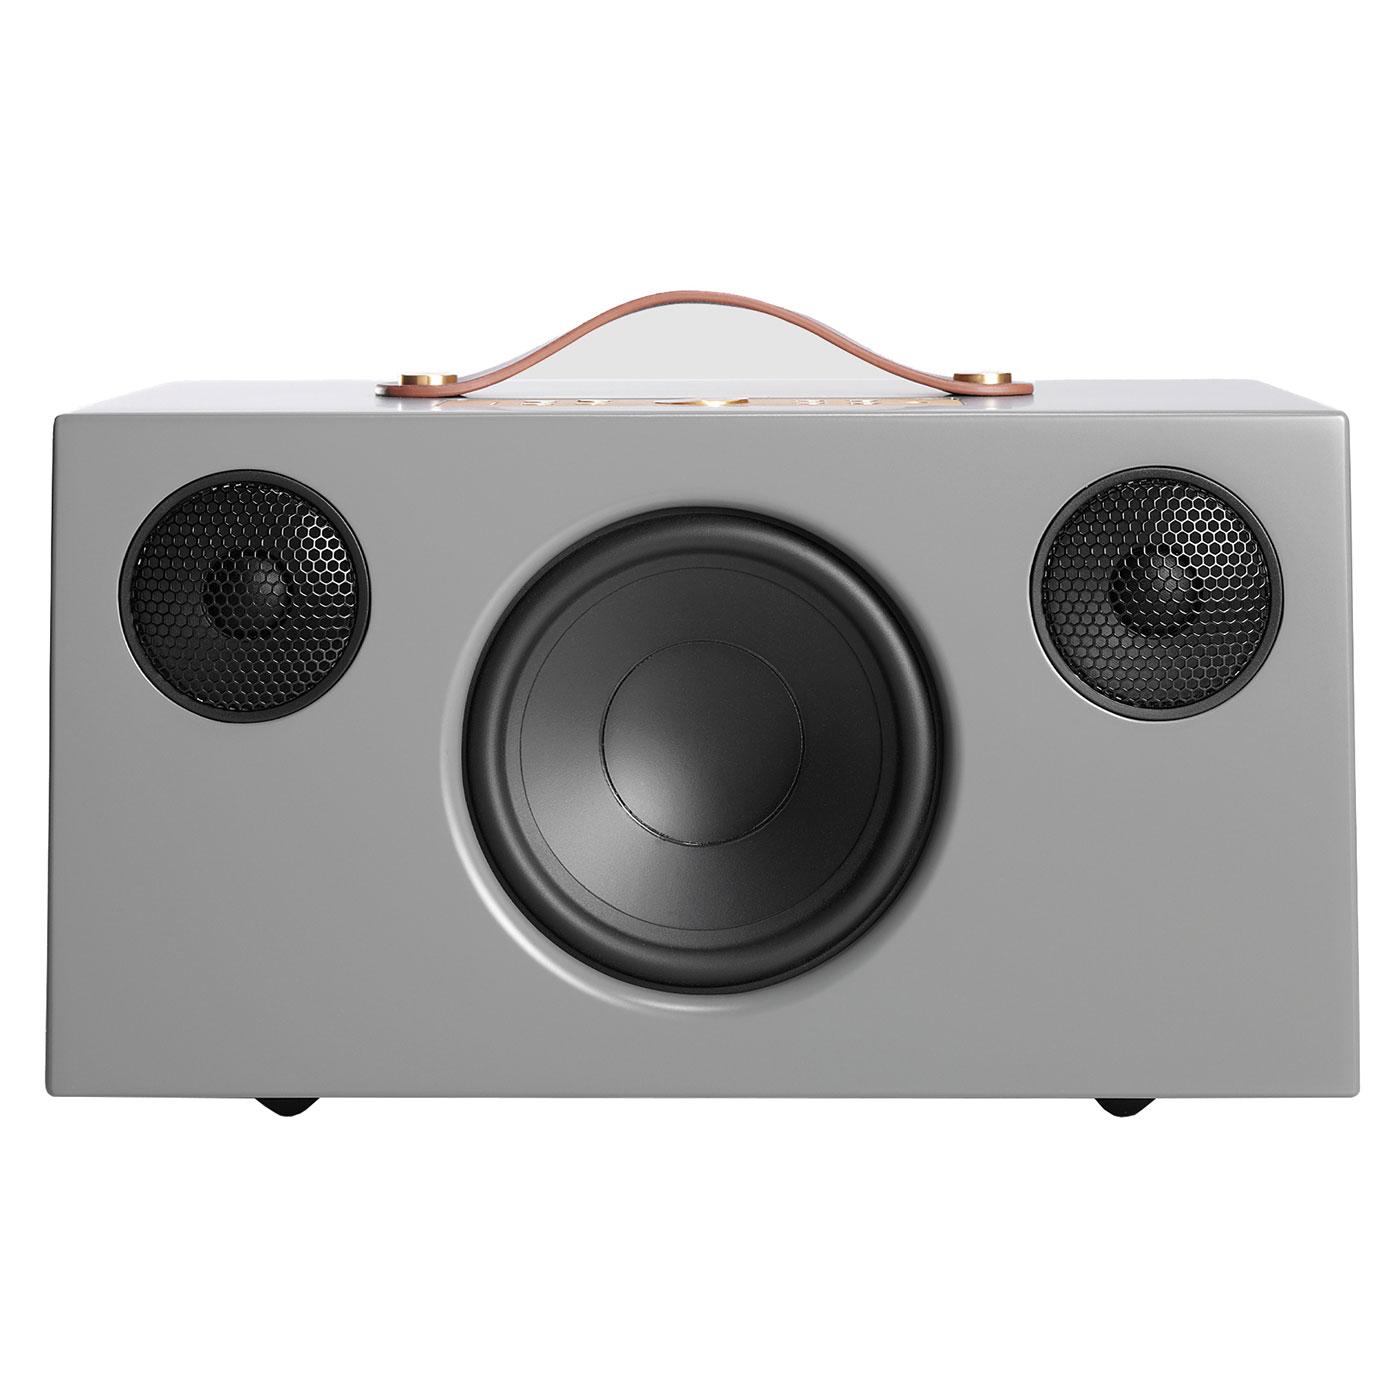 Réseau & Streaming audio Audio Pro Addon C10 Gris Enceinte sans fil multiroom avec Wi-Fi, Bluetooth, AirPlay, Spotify Connect et USB